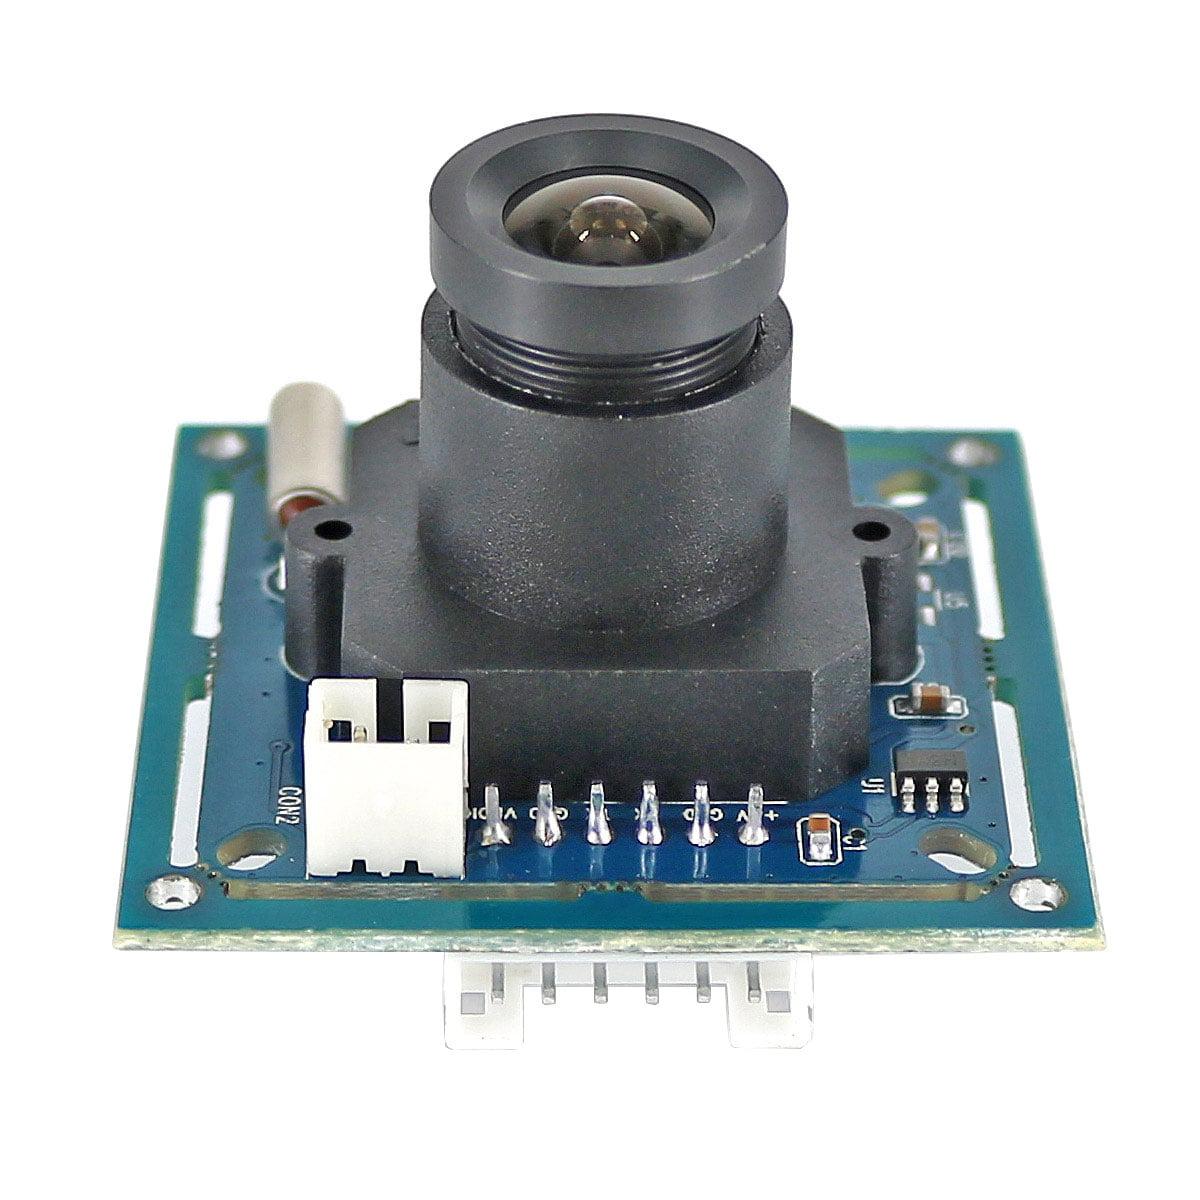 1PCS New CMOS Camera Module 640X480 Pixels For Arduino